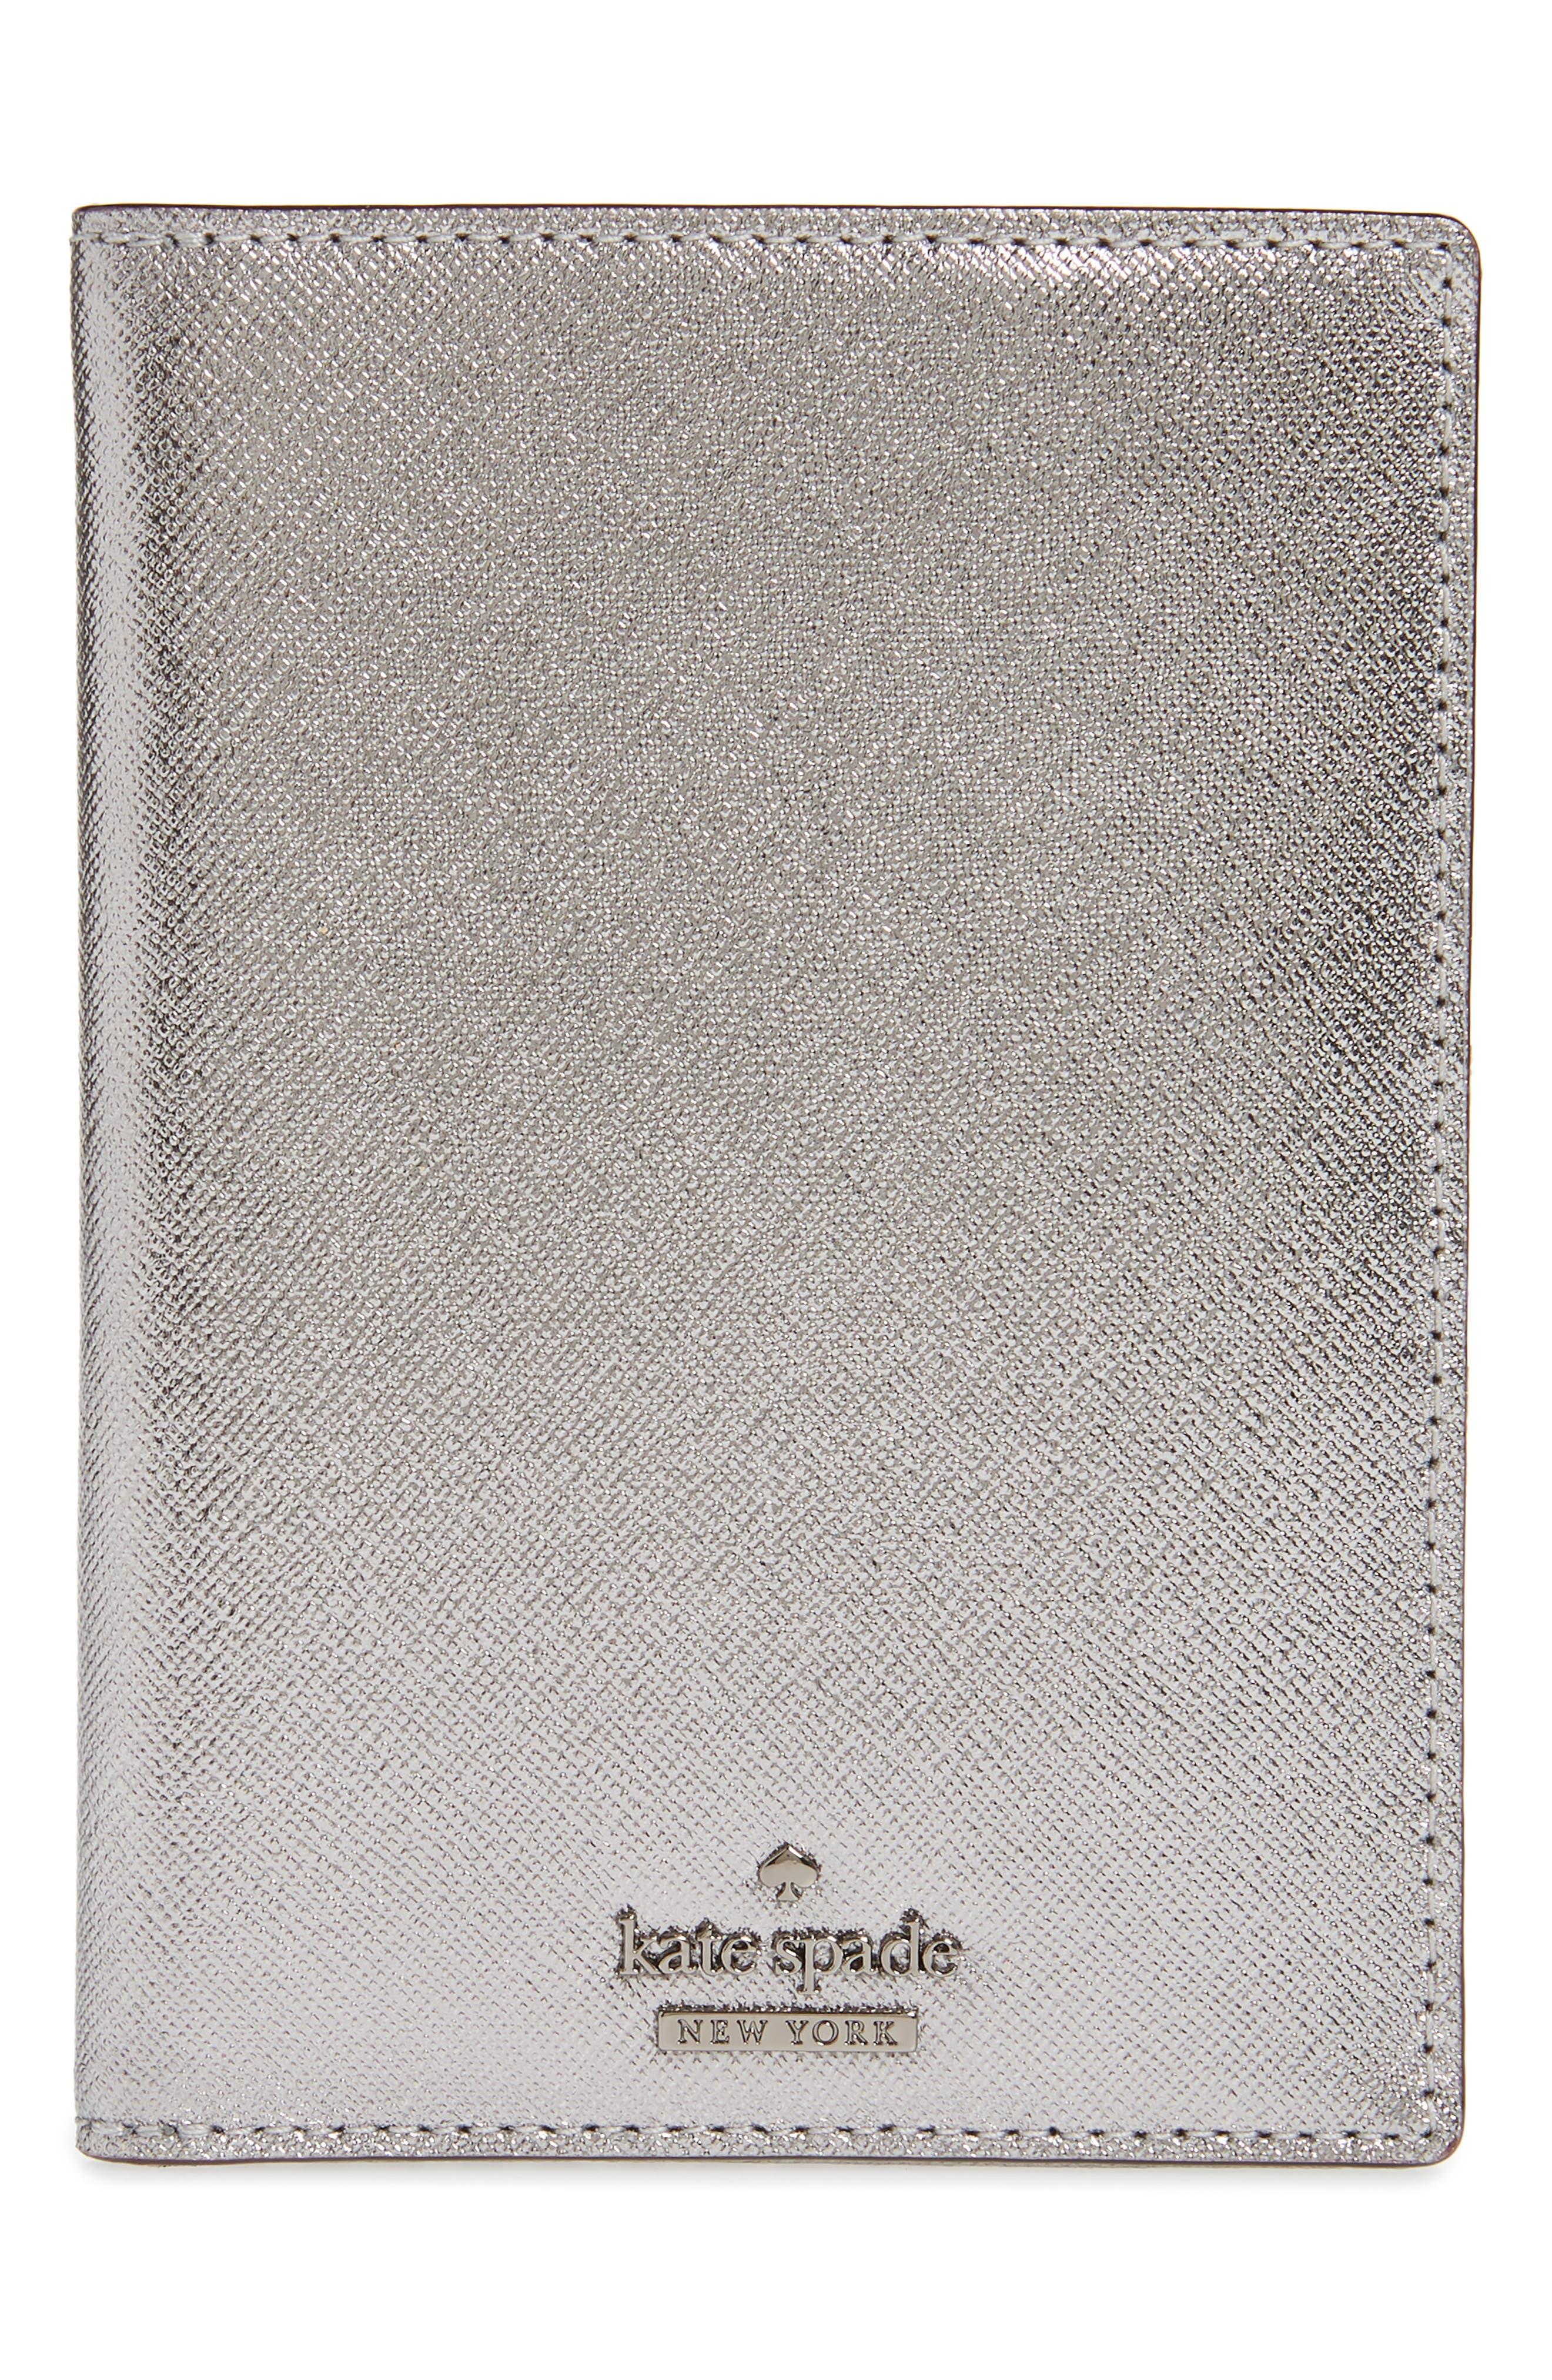 'cameron street' leather passport holder,                         Main,                         color, 040